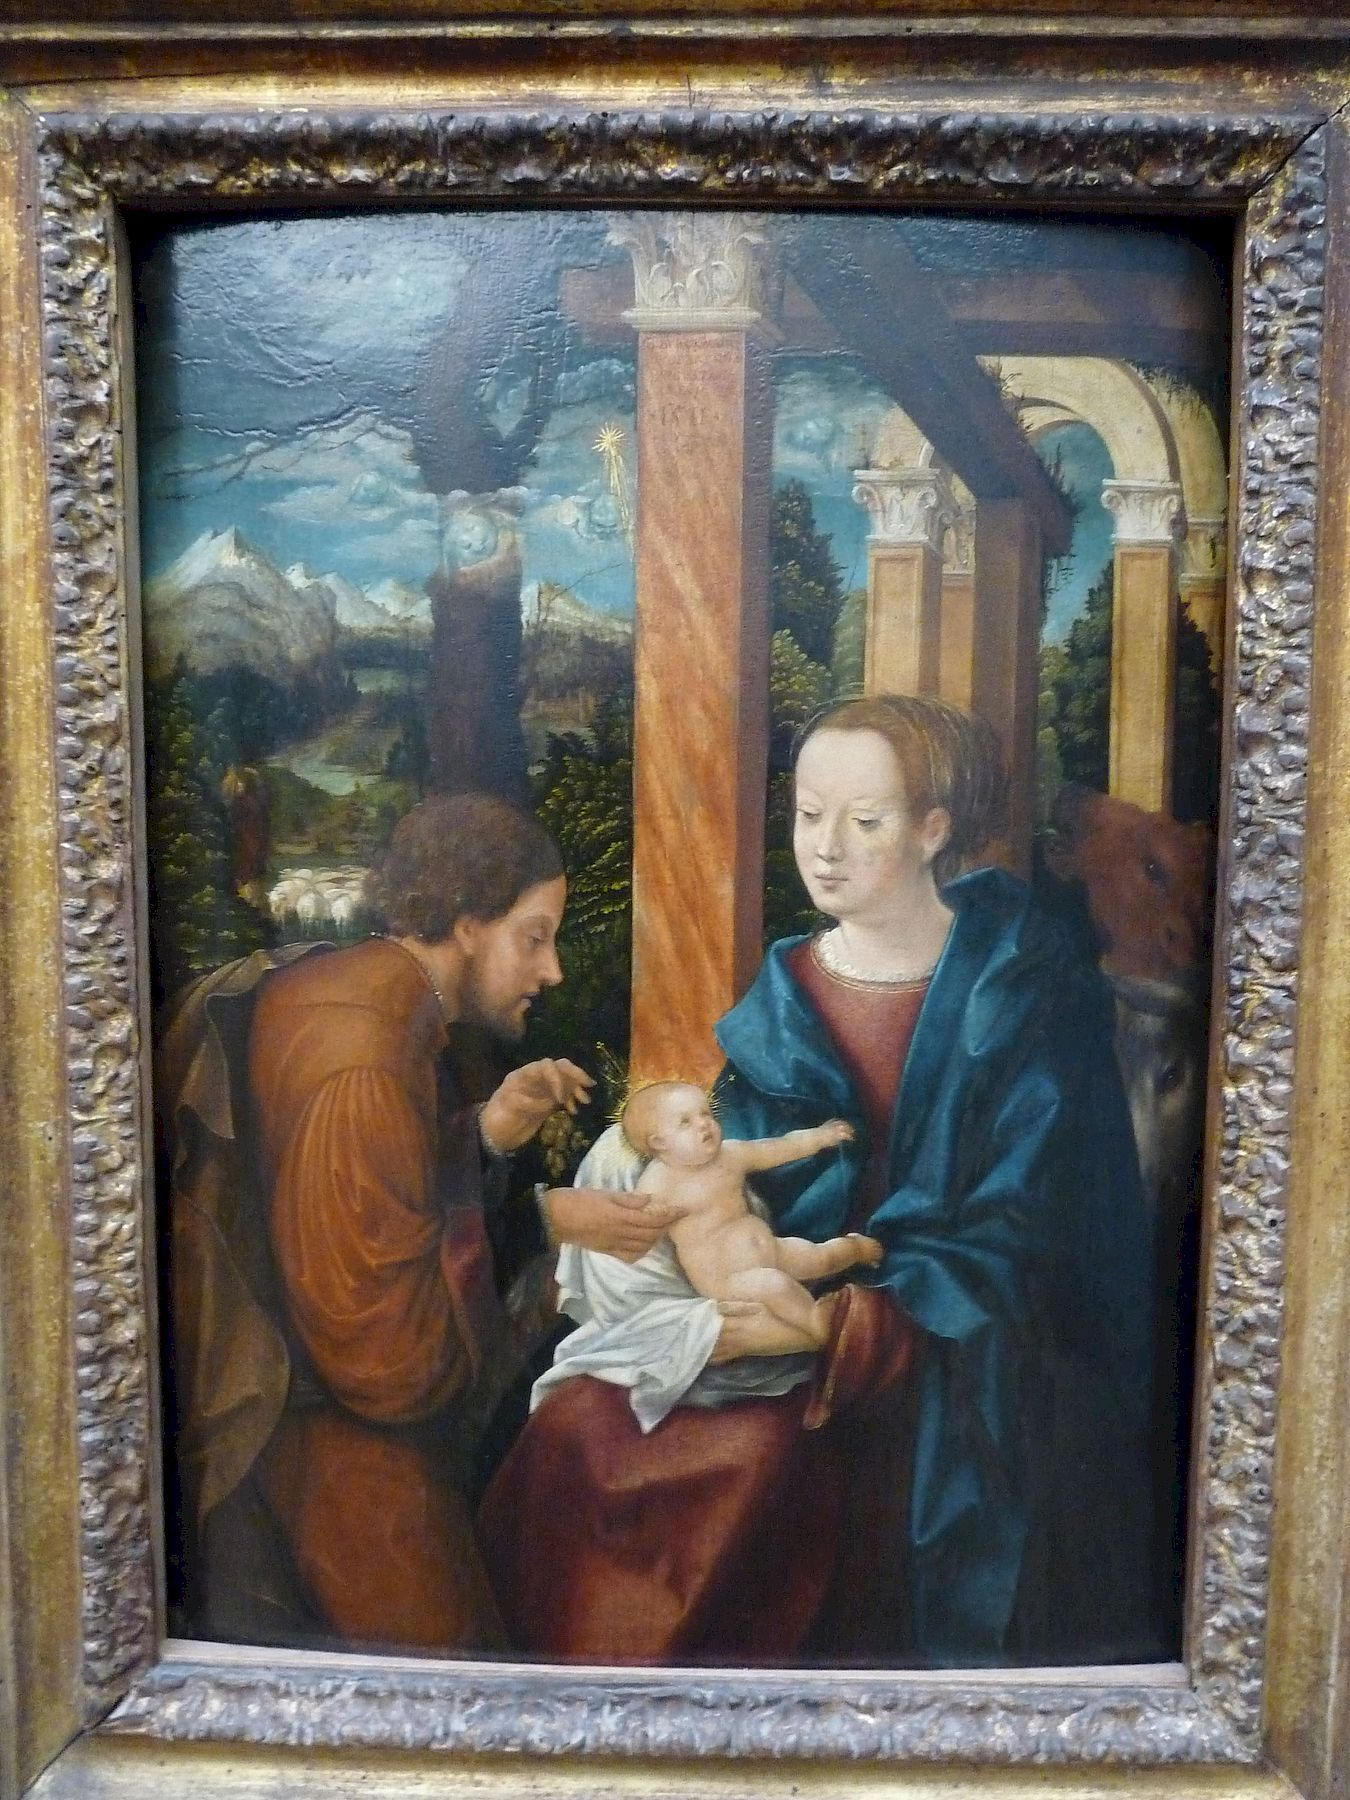 1511_Burkmaier_Die-Geburst-Christi_Berlin_Gemäldegalerie_P1520763_JFMartine